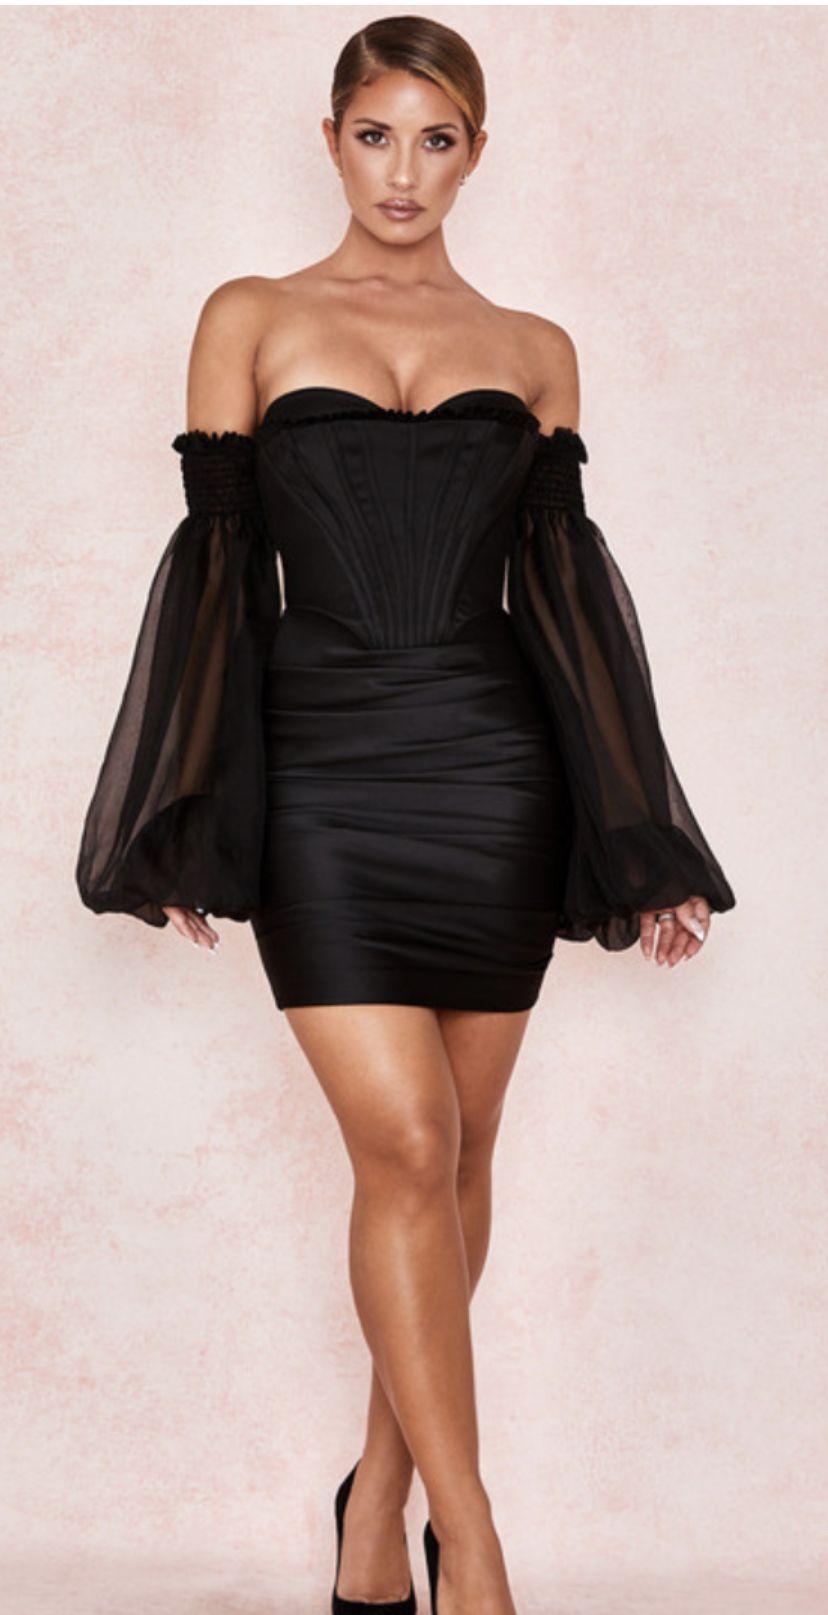 Clothing Structured Dresses Beau Black Satin And Chiffon Corset Dress Corset Dress Structured Dress Dresses [ 1615 x 828 Pixel ]